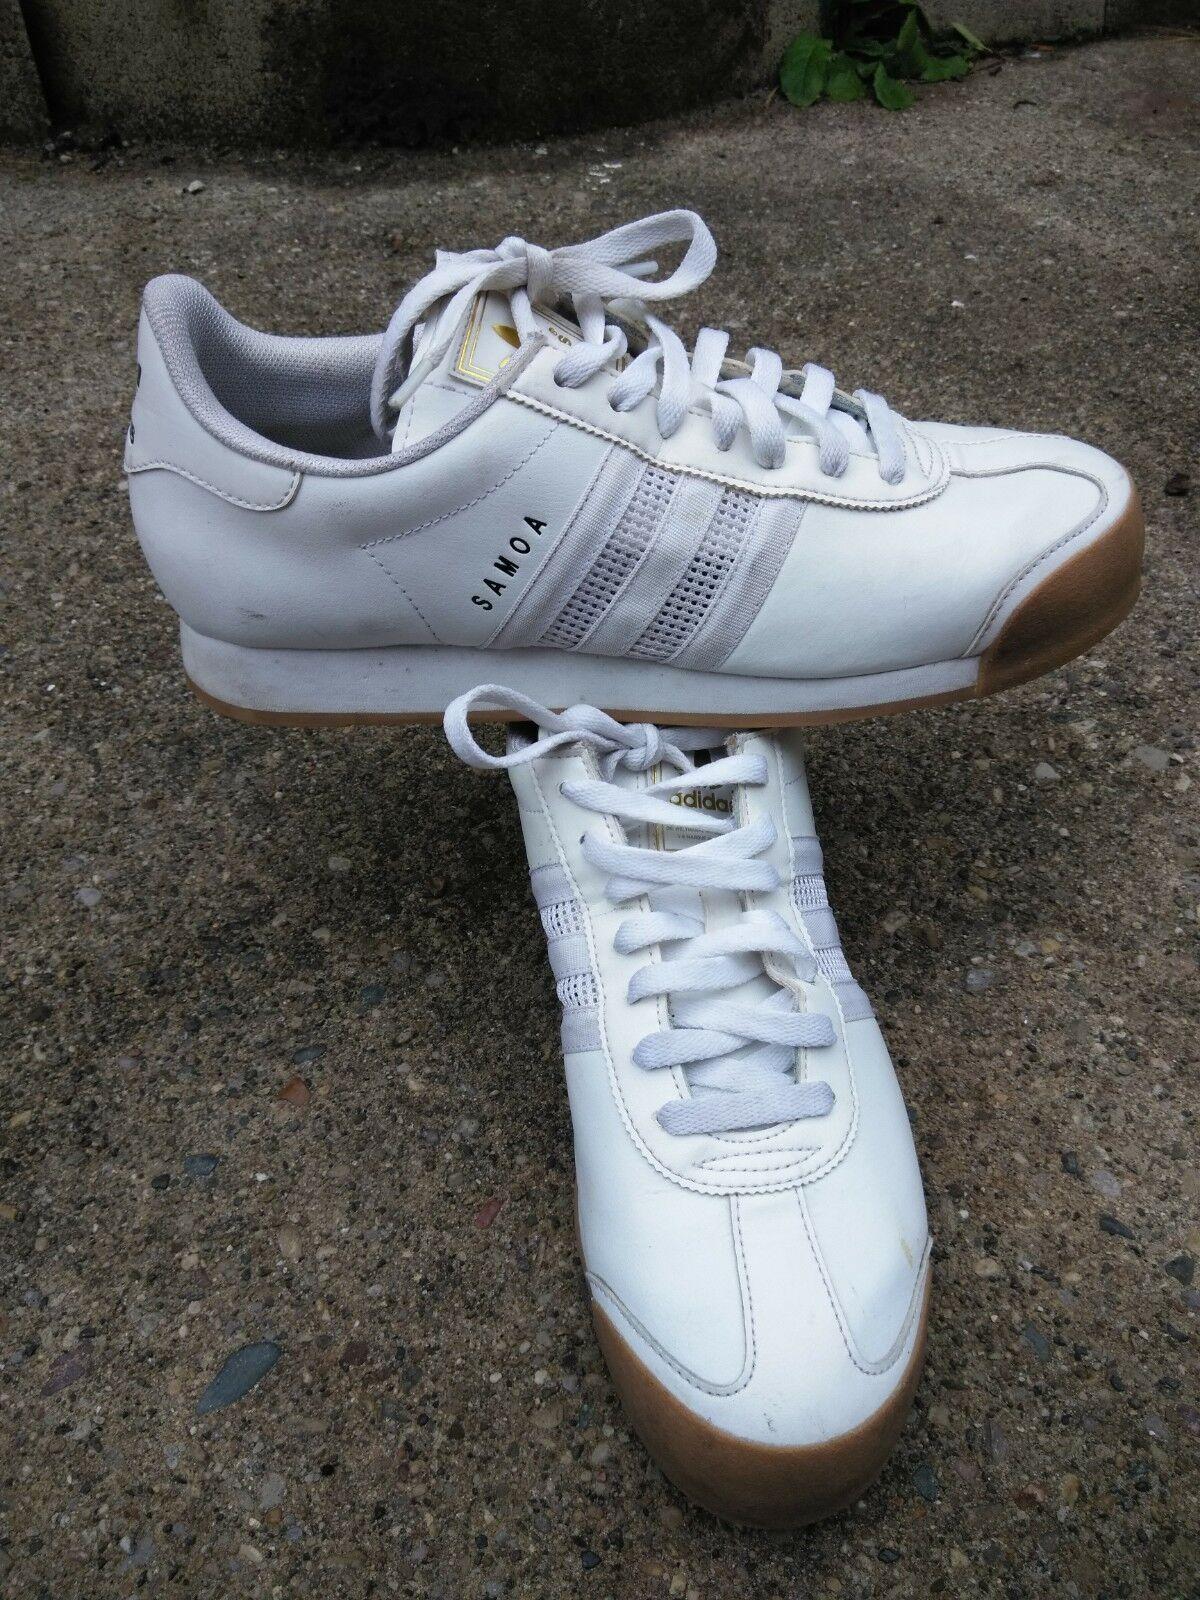 Adidas samoa samoa samoa scarpe da uomo   Acquisti online    Uomo/Donne Scarpa  e9dc1e